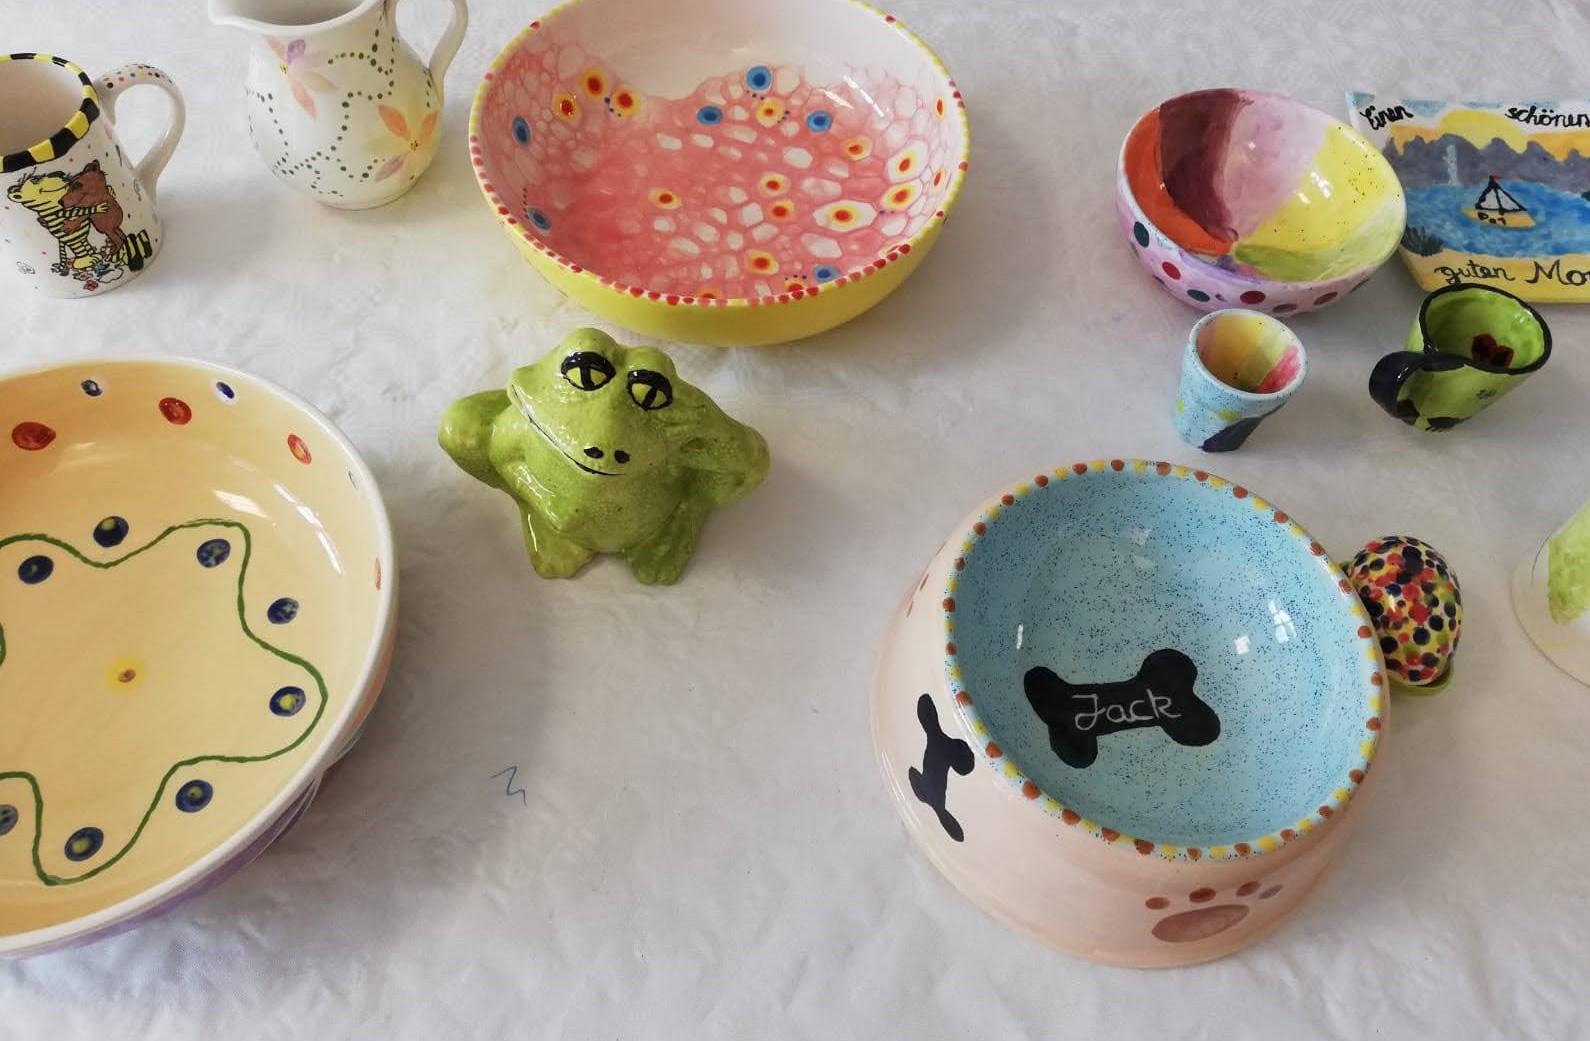 Keramik Selbst Bemalen Wundervolle Geschenkideen Aus Keramik